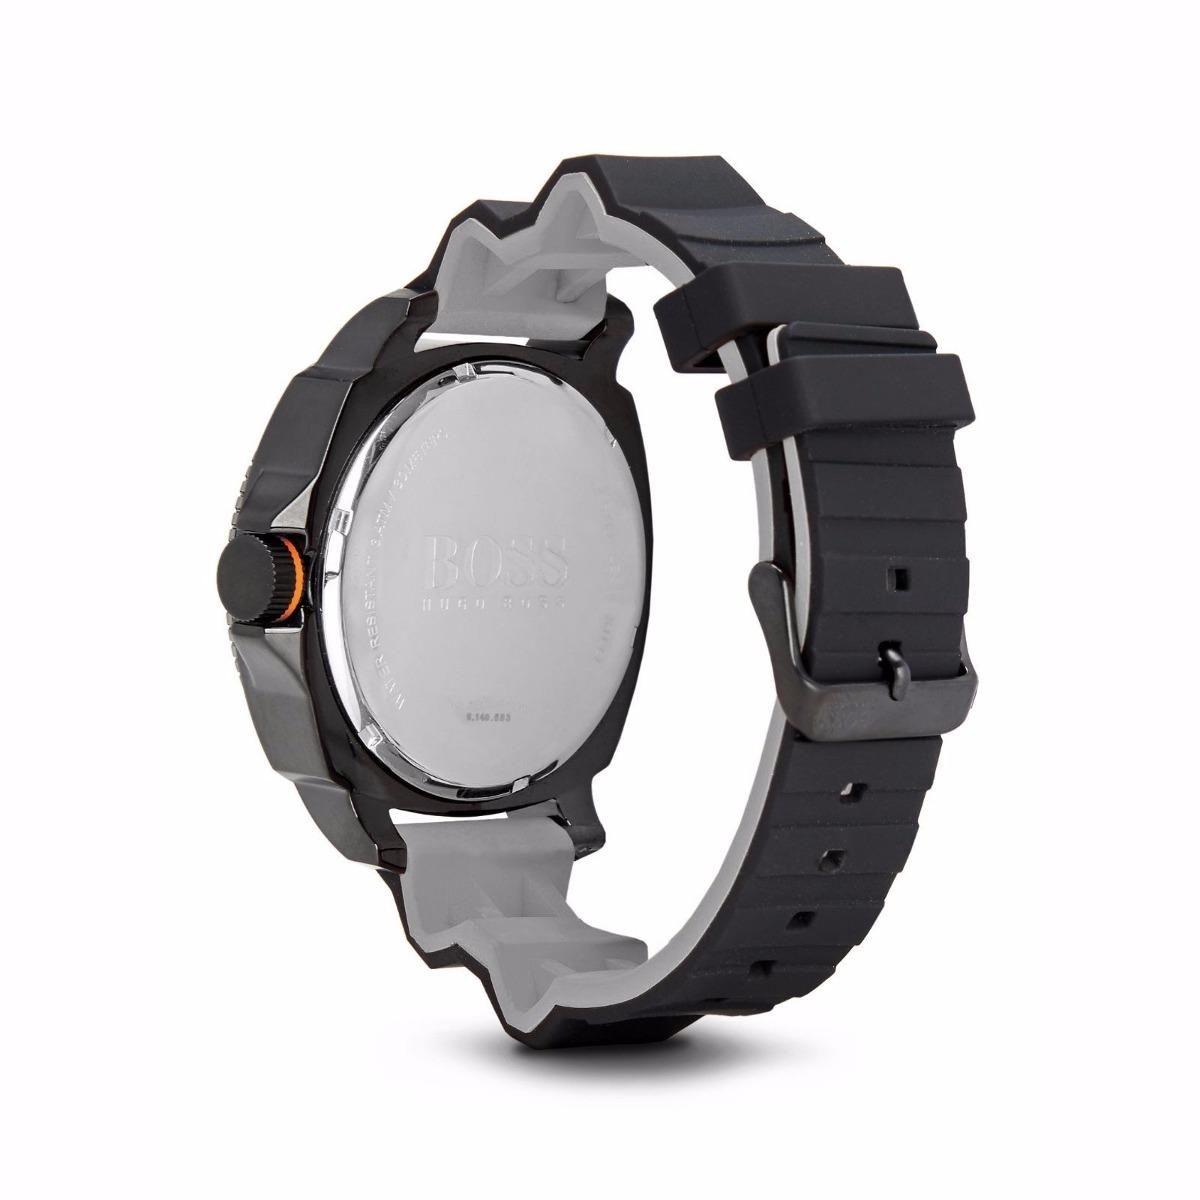 1c3559bf56a8 reloj hugo boss orange acero silicón negro hombre 1513106. Cargando zoom.